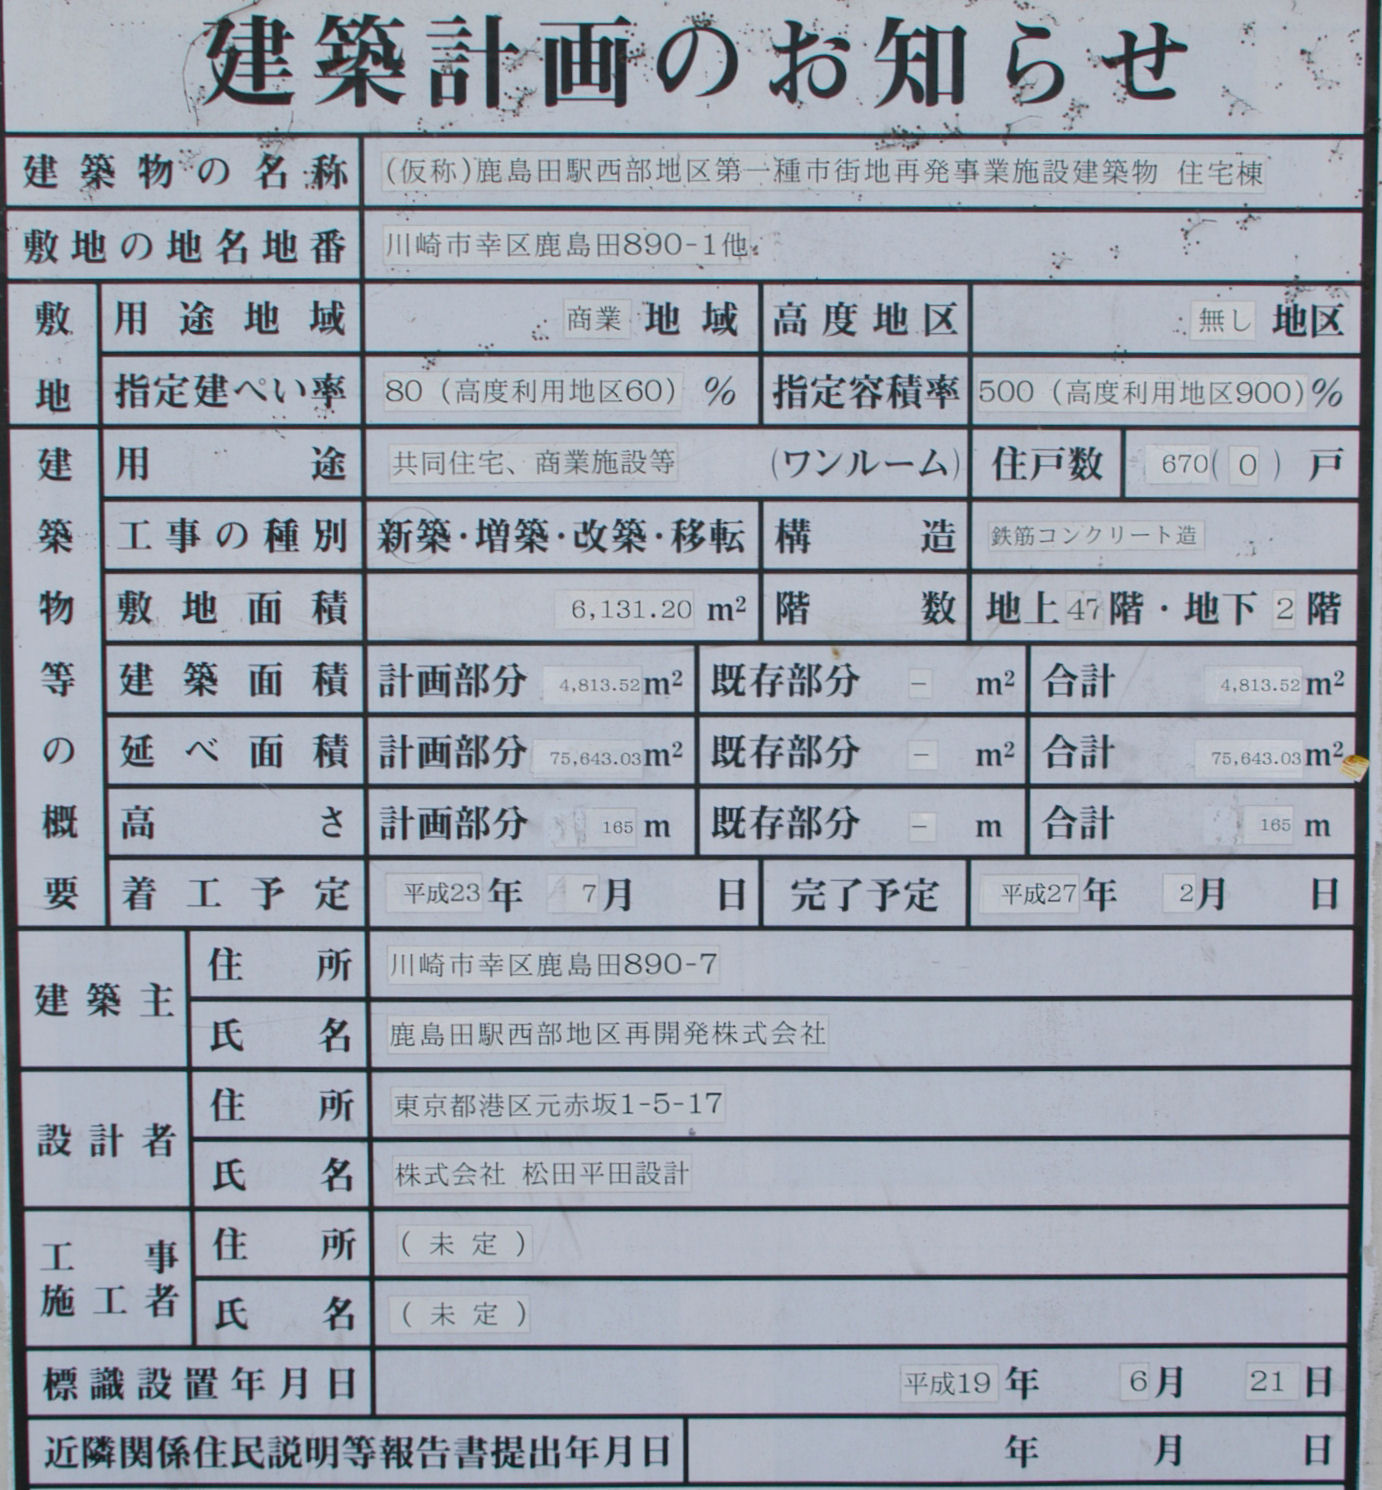 kajimada0200.jpg